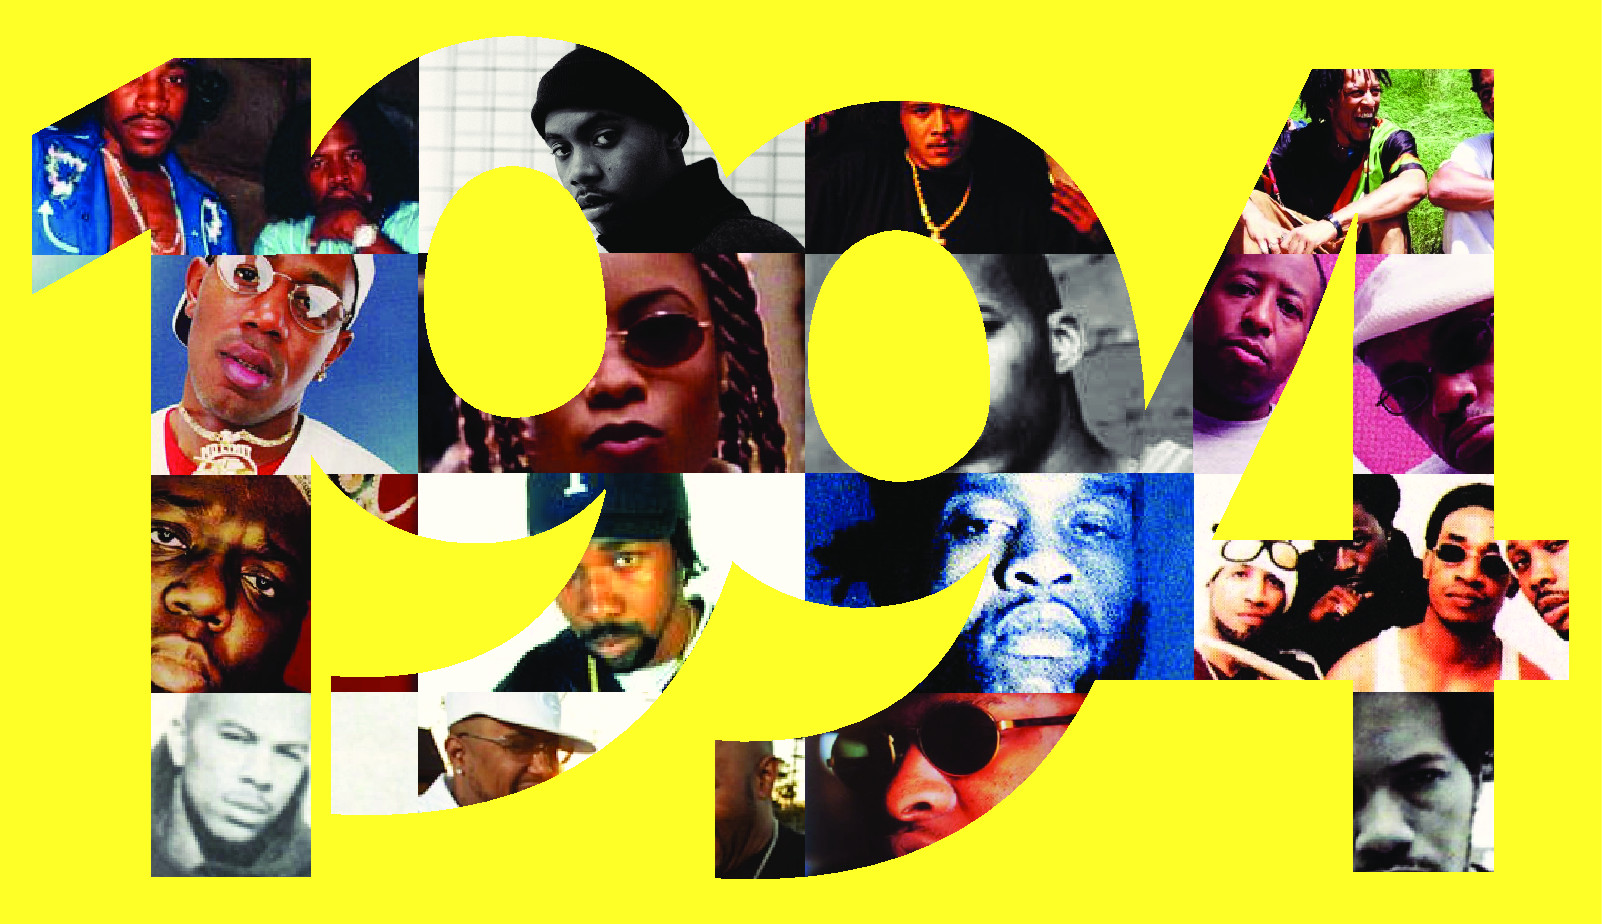 The 1994 Rap Album Matrix: Is This Hip-Hop's Greatest Year?